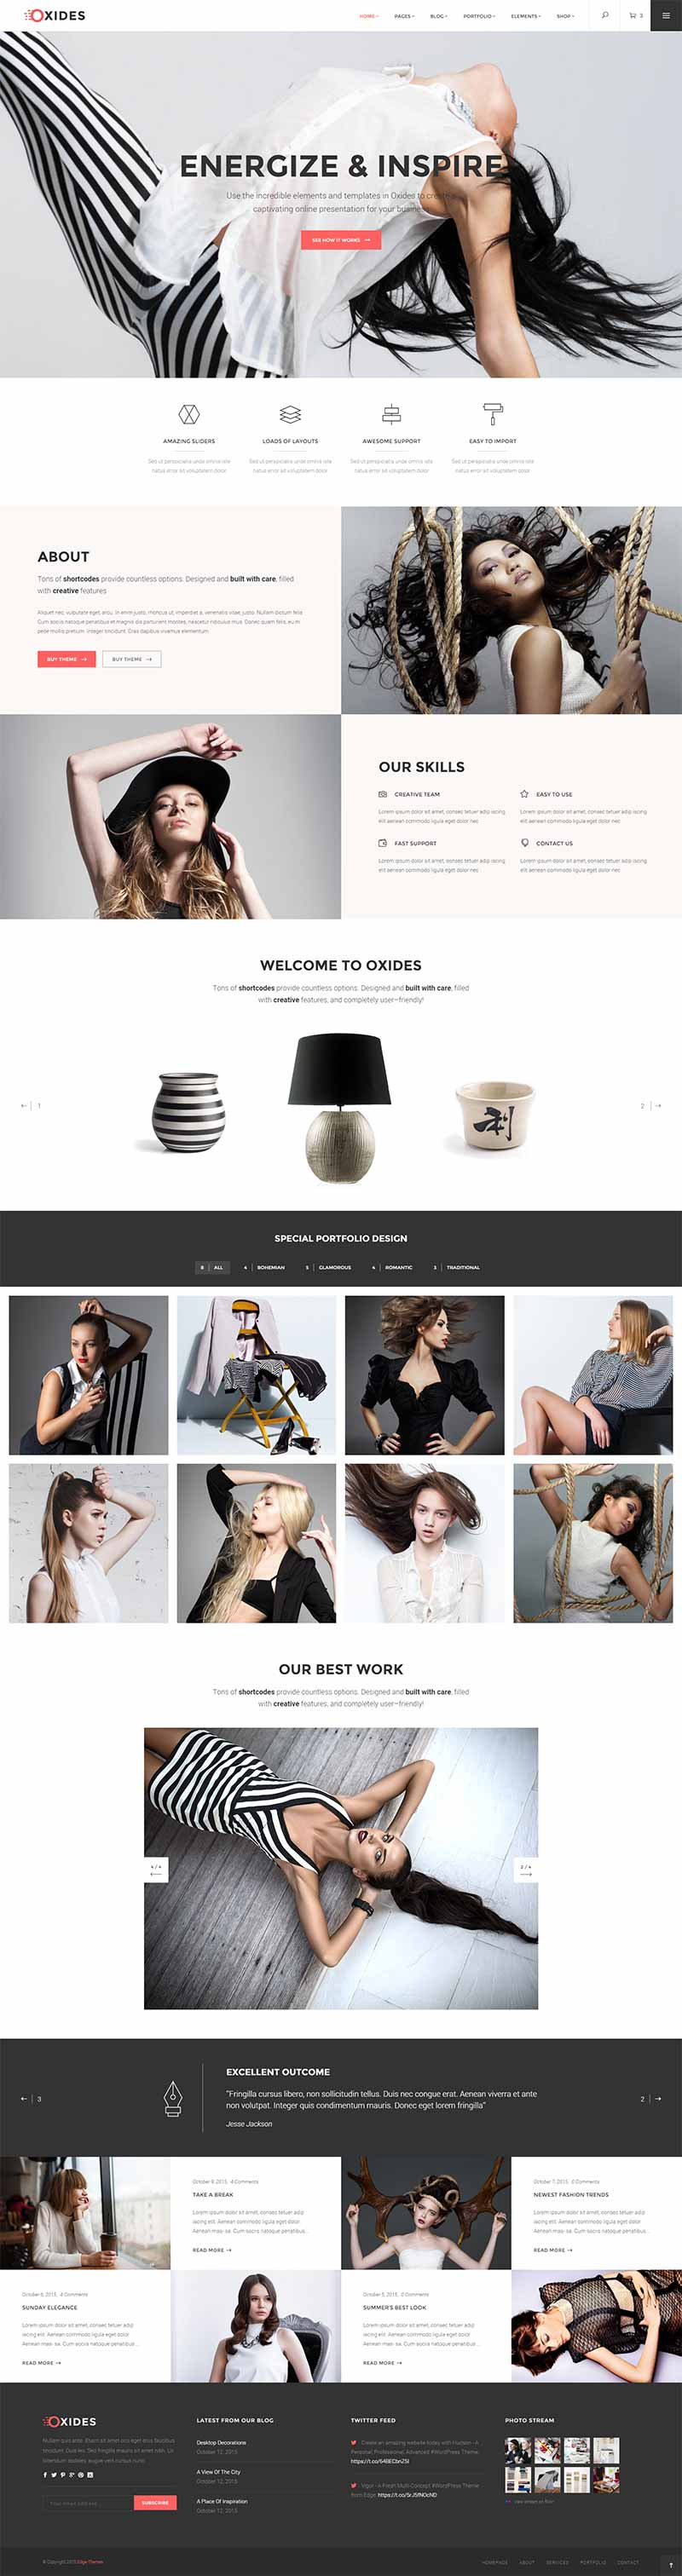 Oxides—Fashion-Home